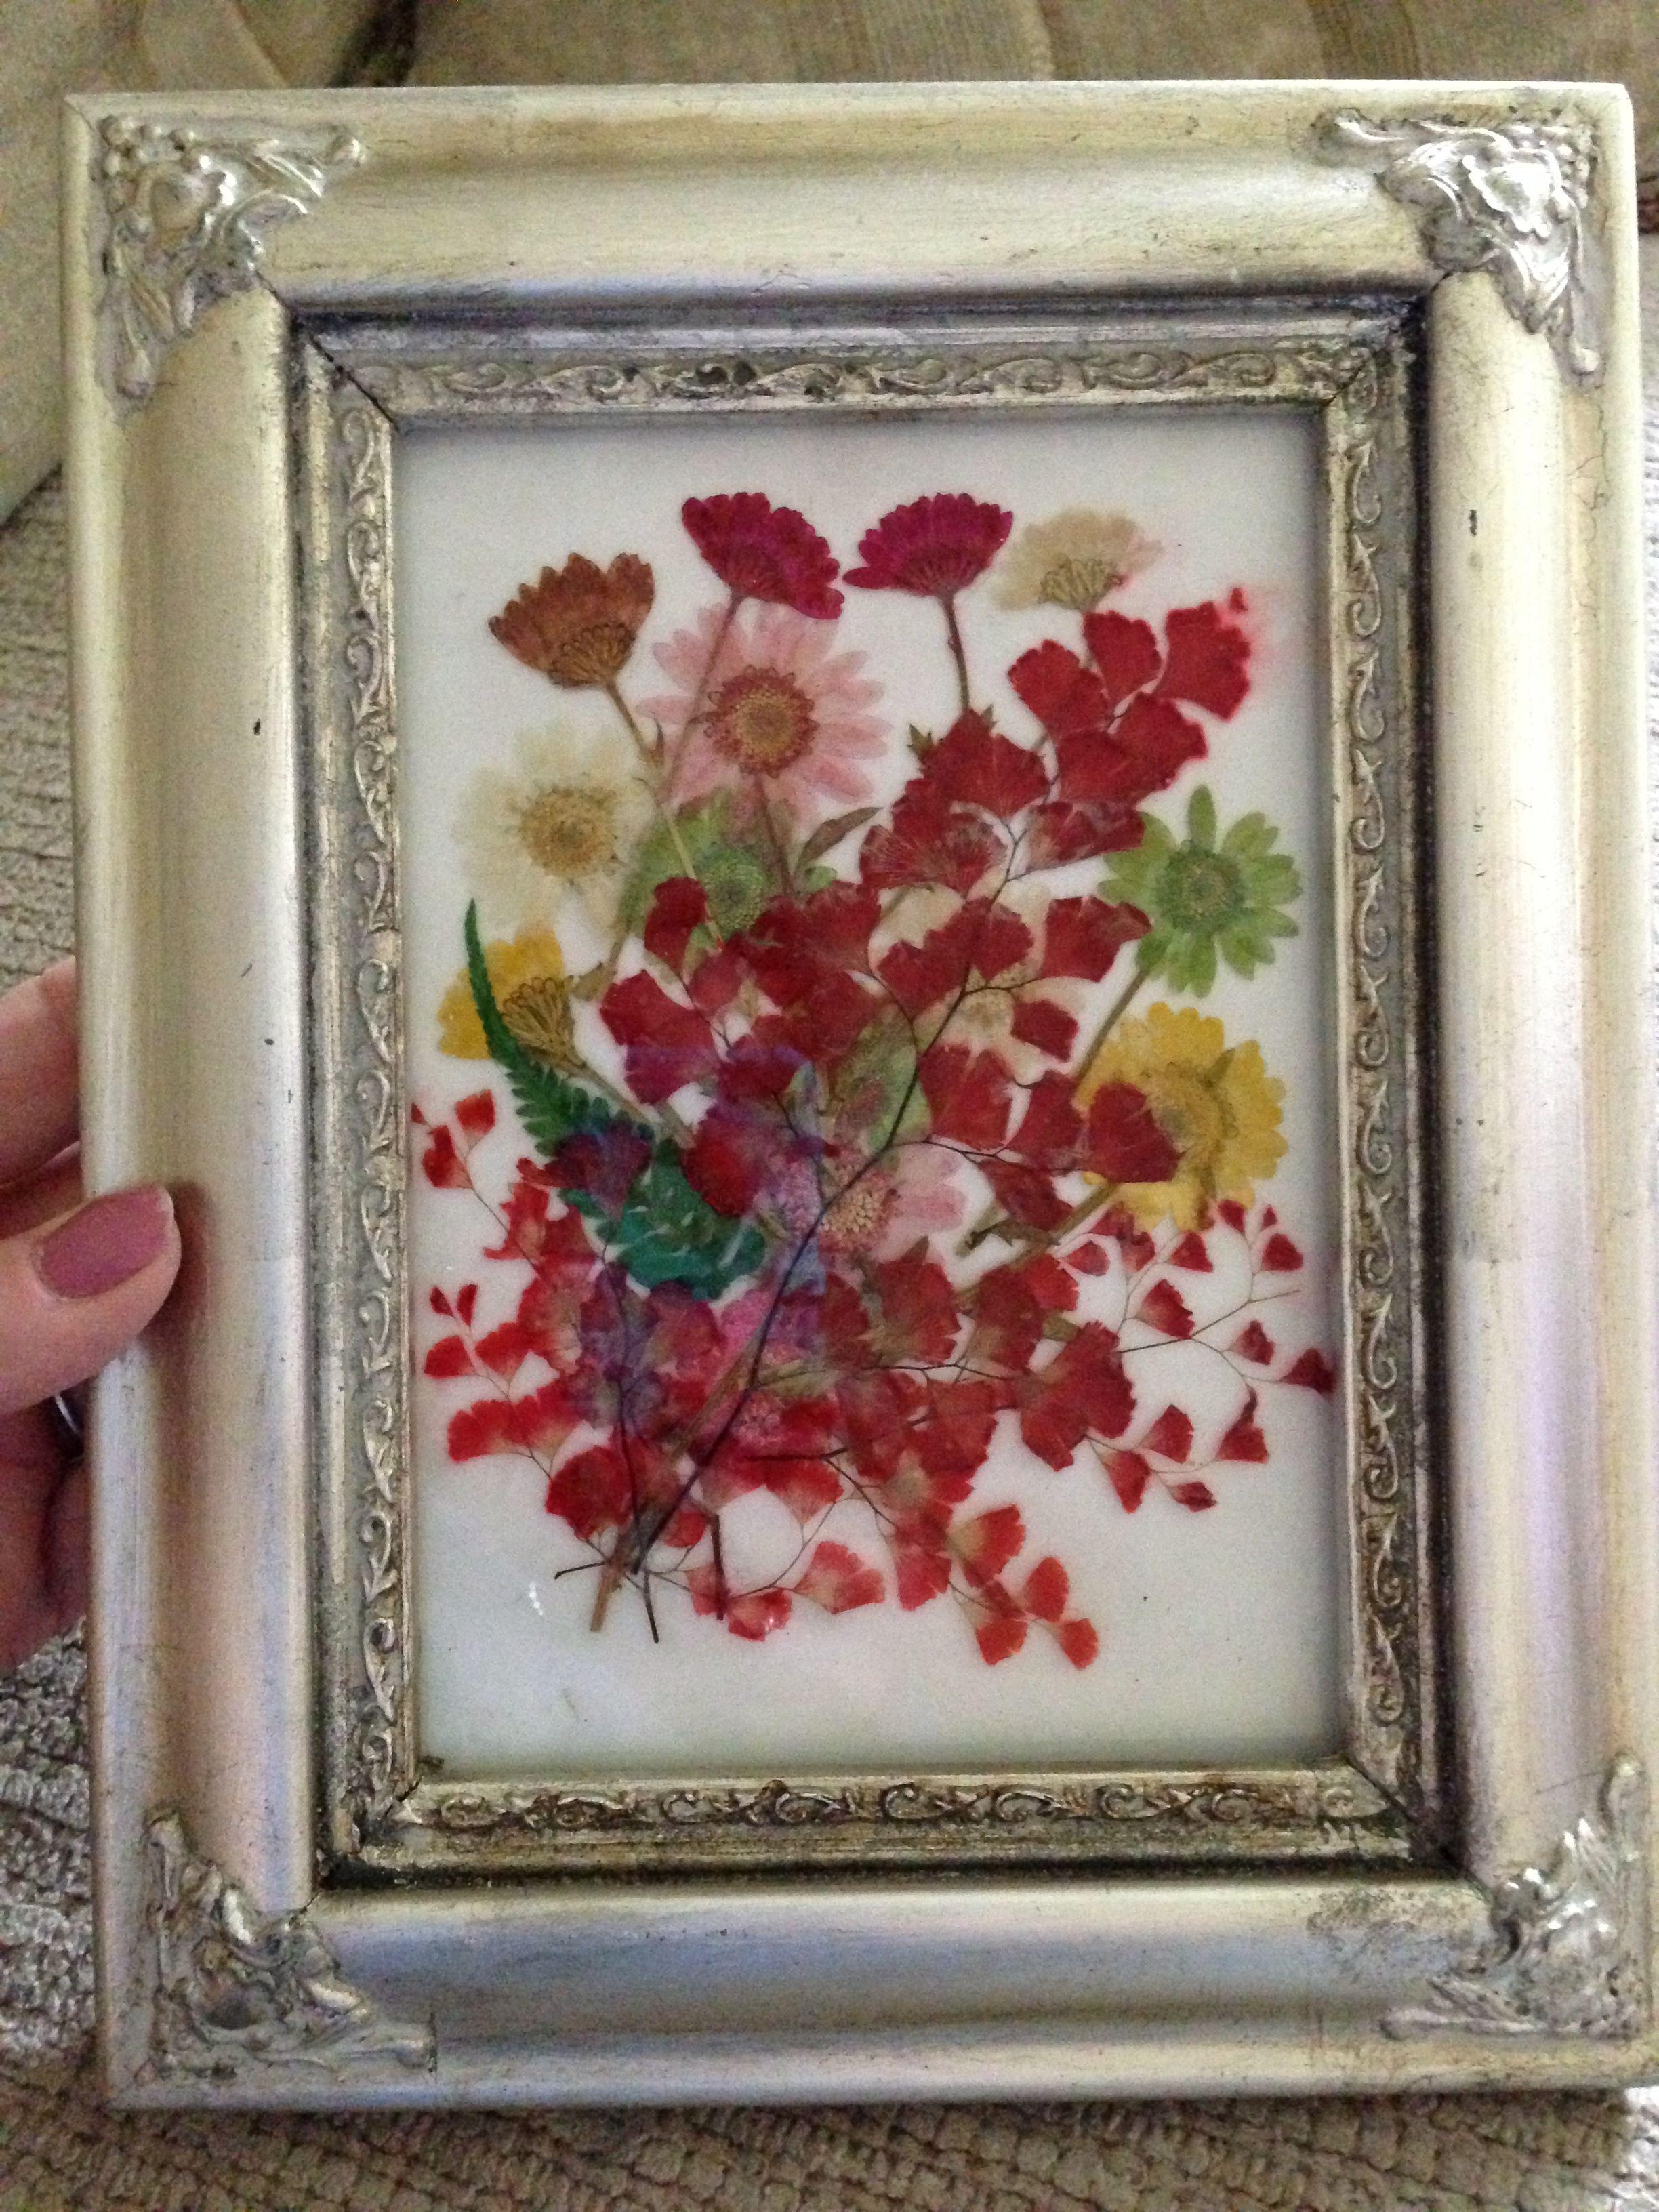 Framed dried flowers | Crafts I have done | Pinterest | Flower ...